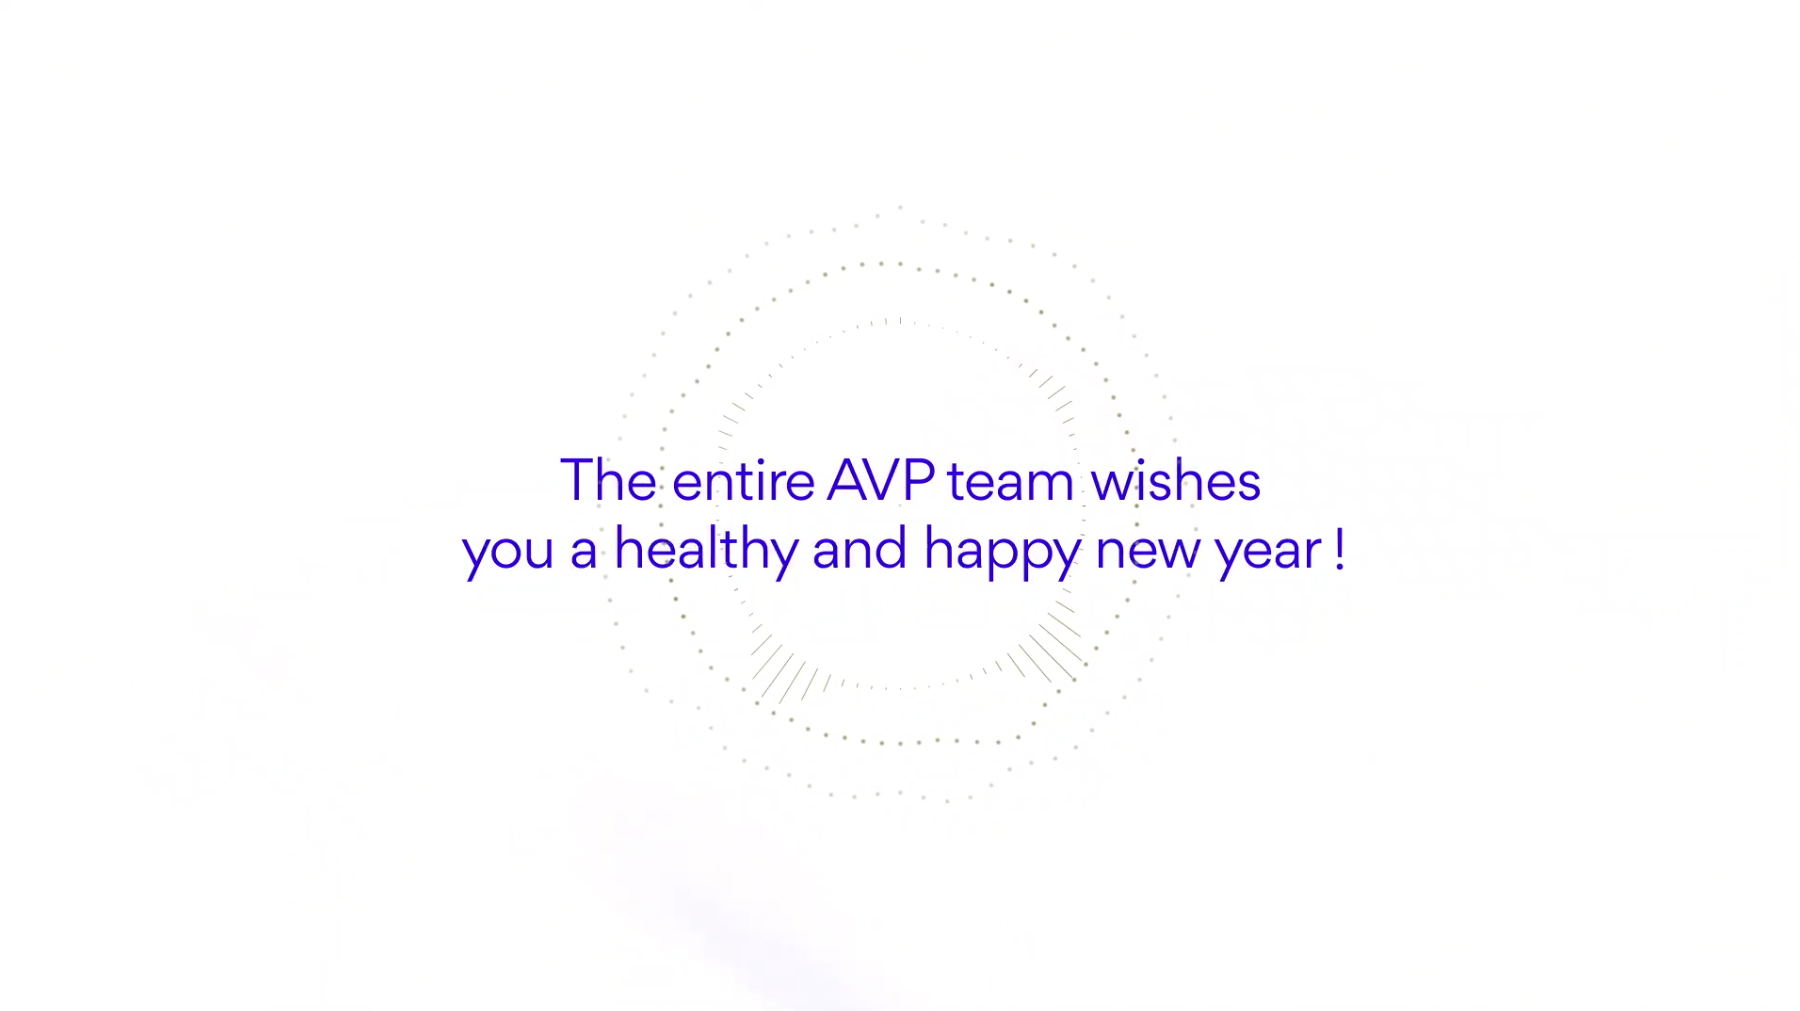 Best wishes from AVP team